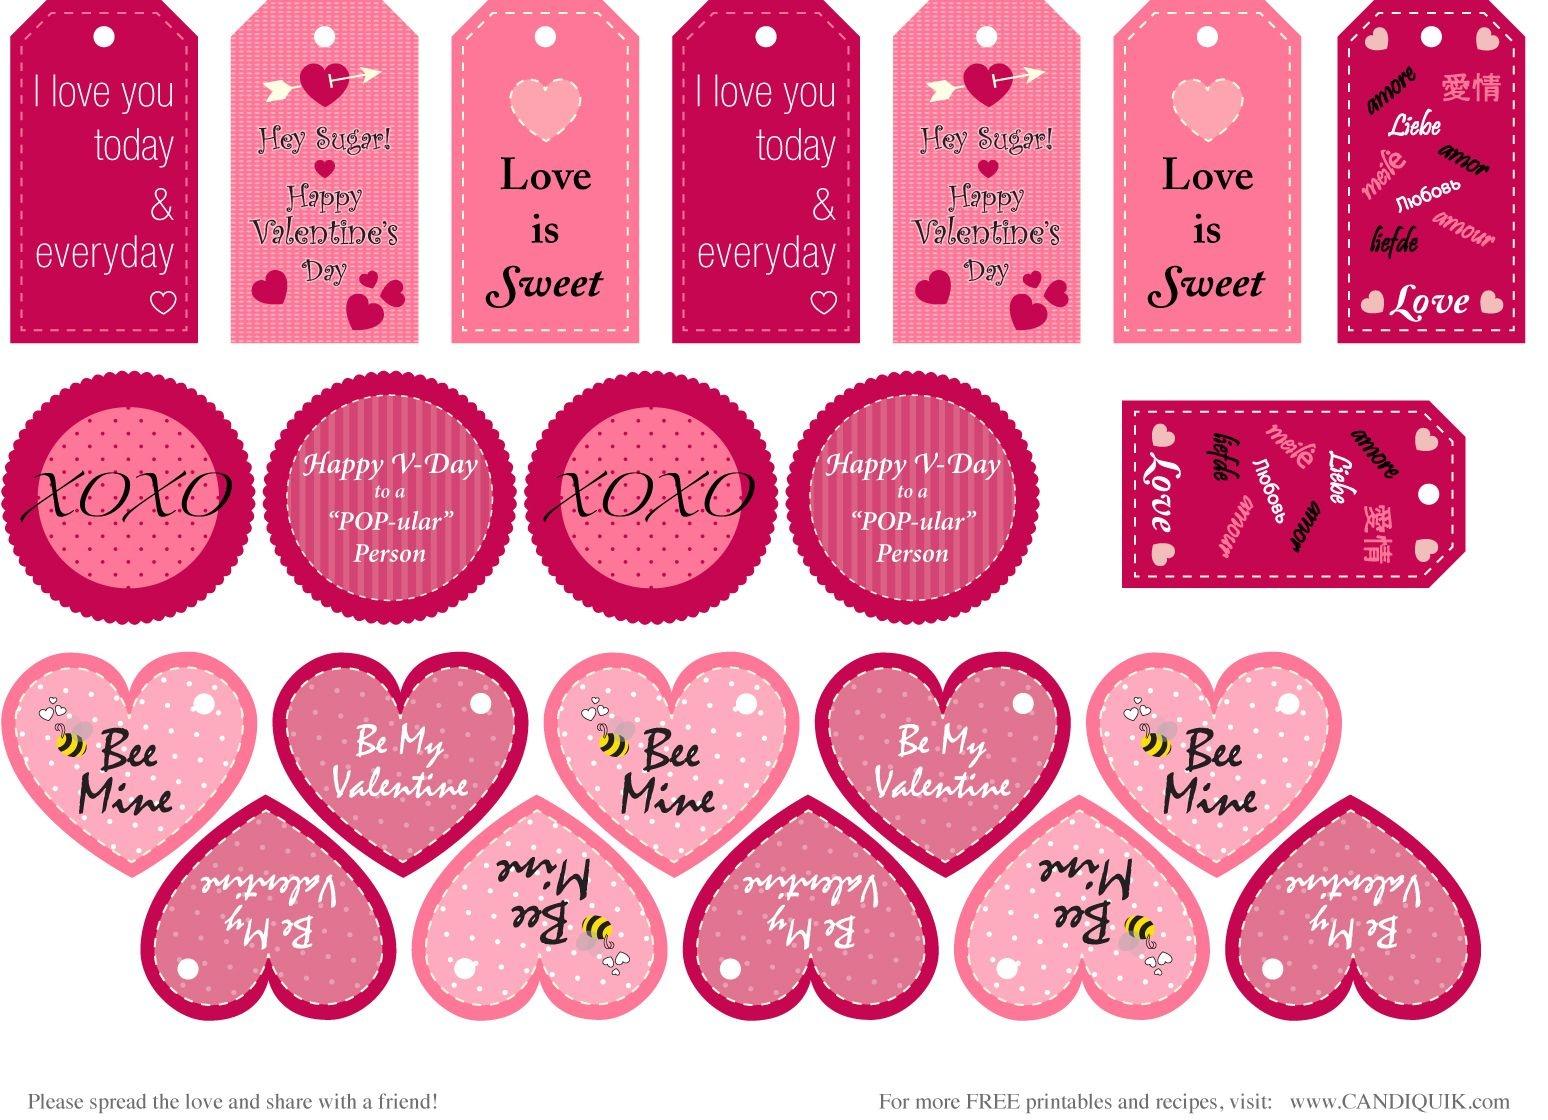 Free} Printables | Valentines | Valentine's Day Printables - Free Valentine Printables